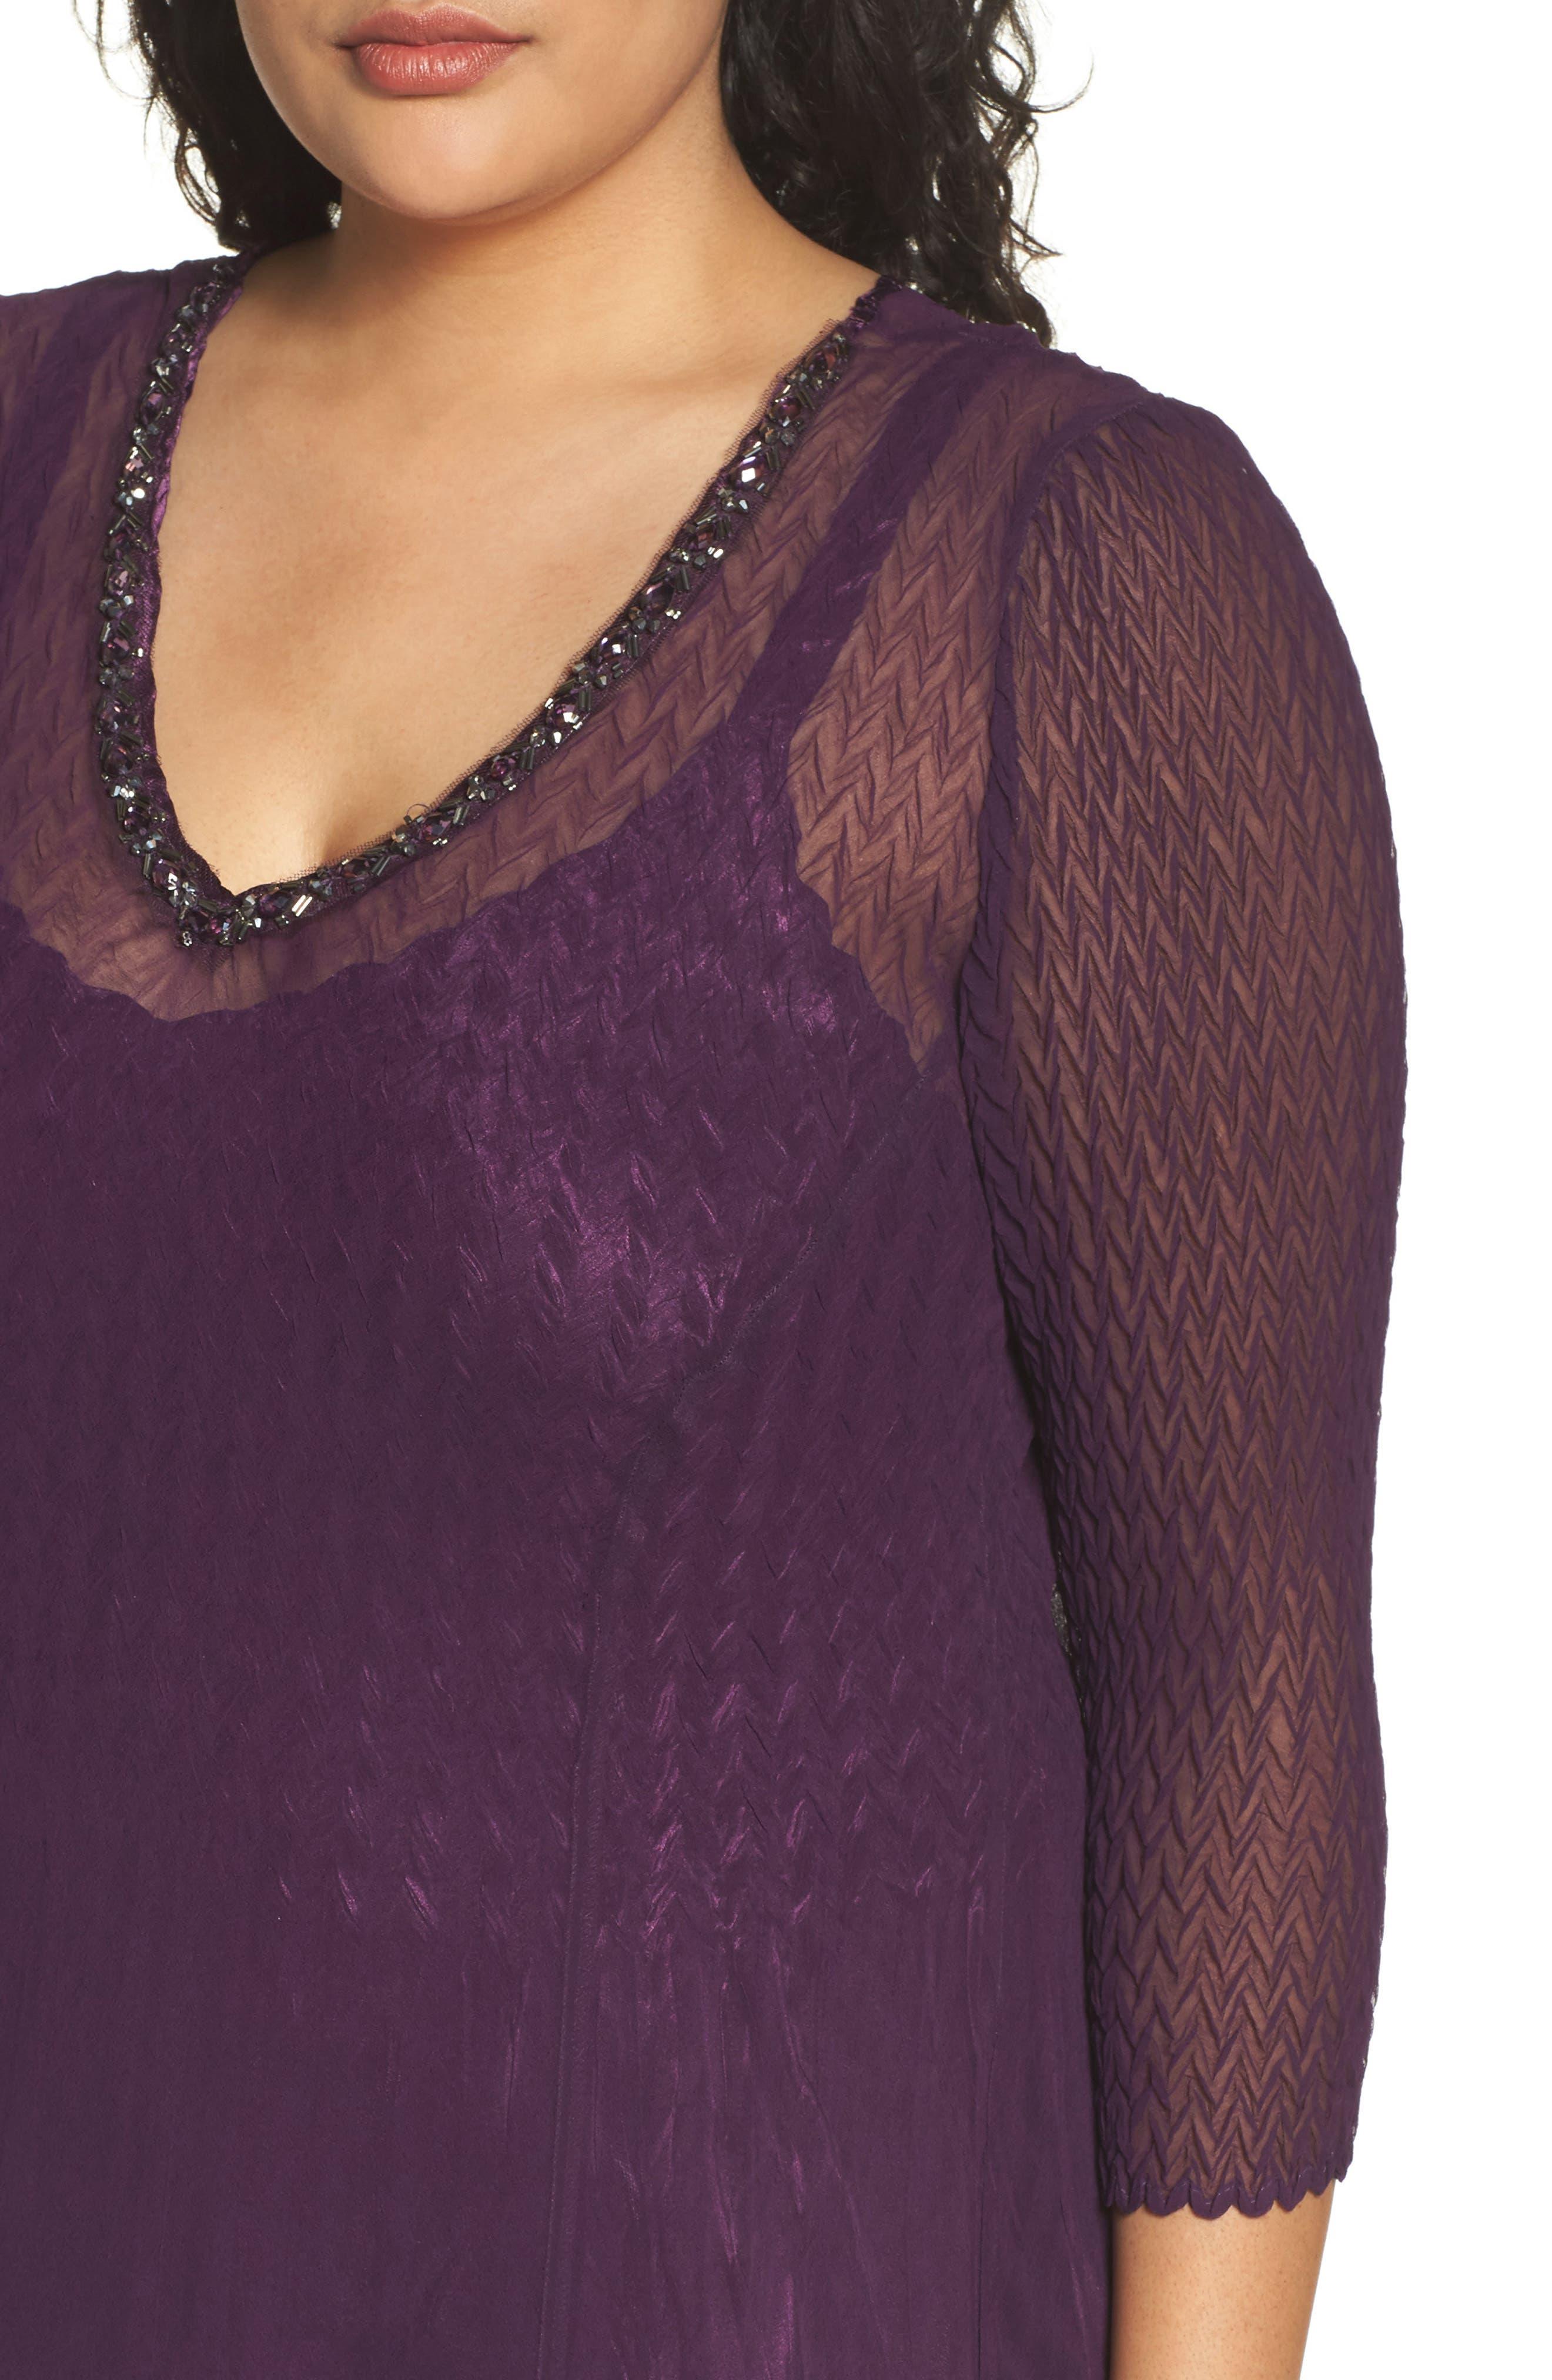 Chiffon Layer Charmeuse Dress,                             Alternate thumbnail 4, color,                             507